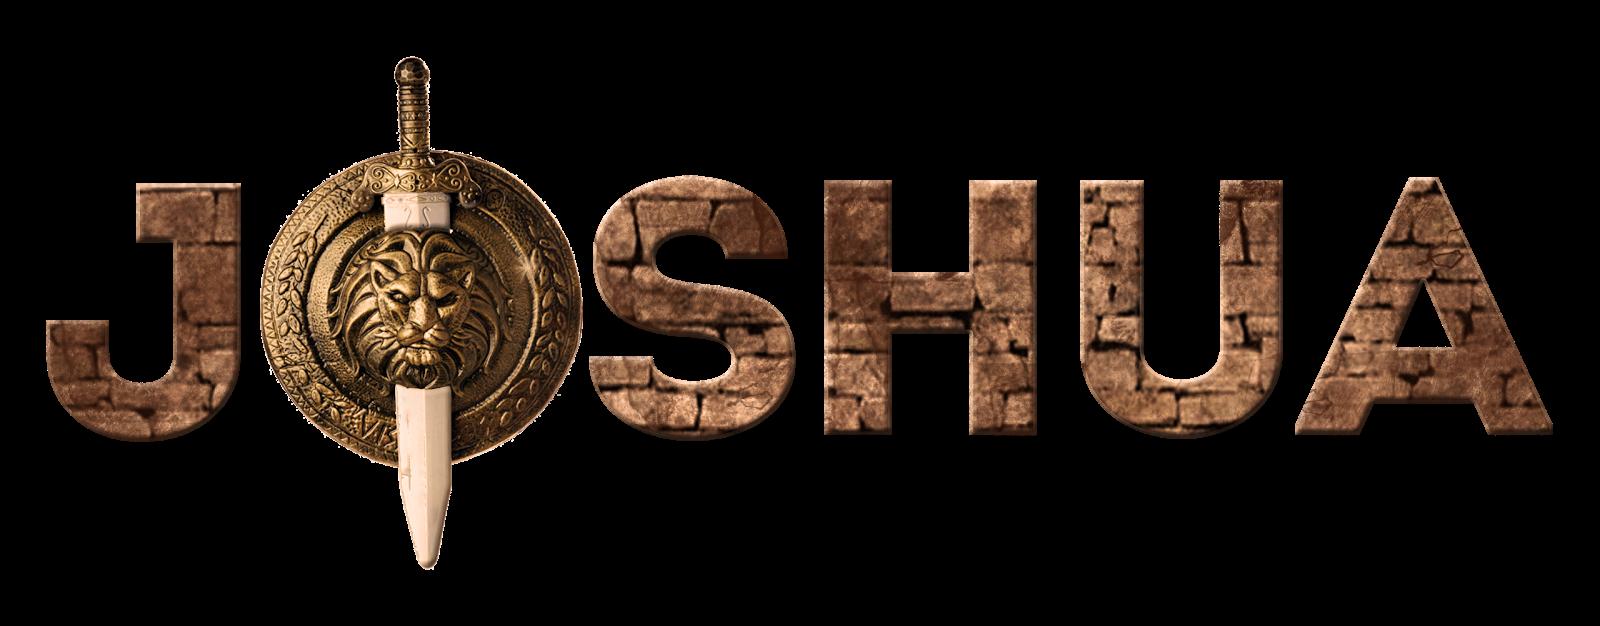 book of Joshua sermon series